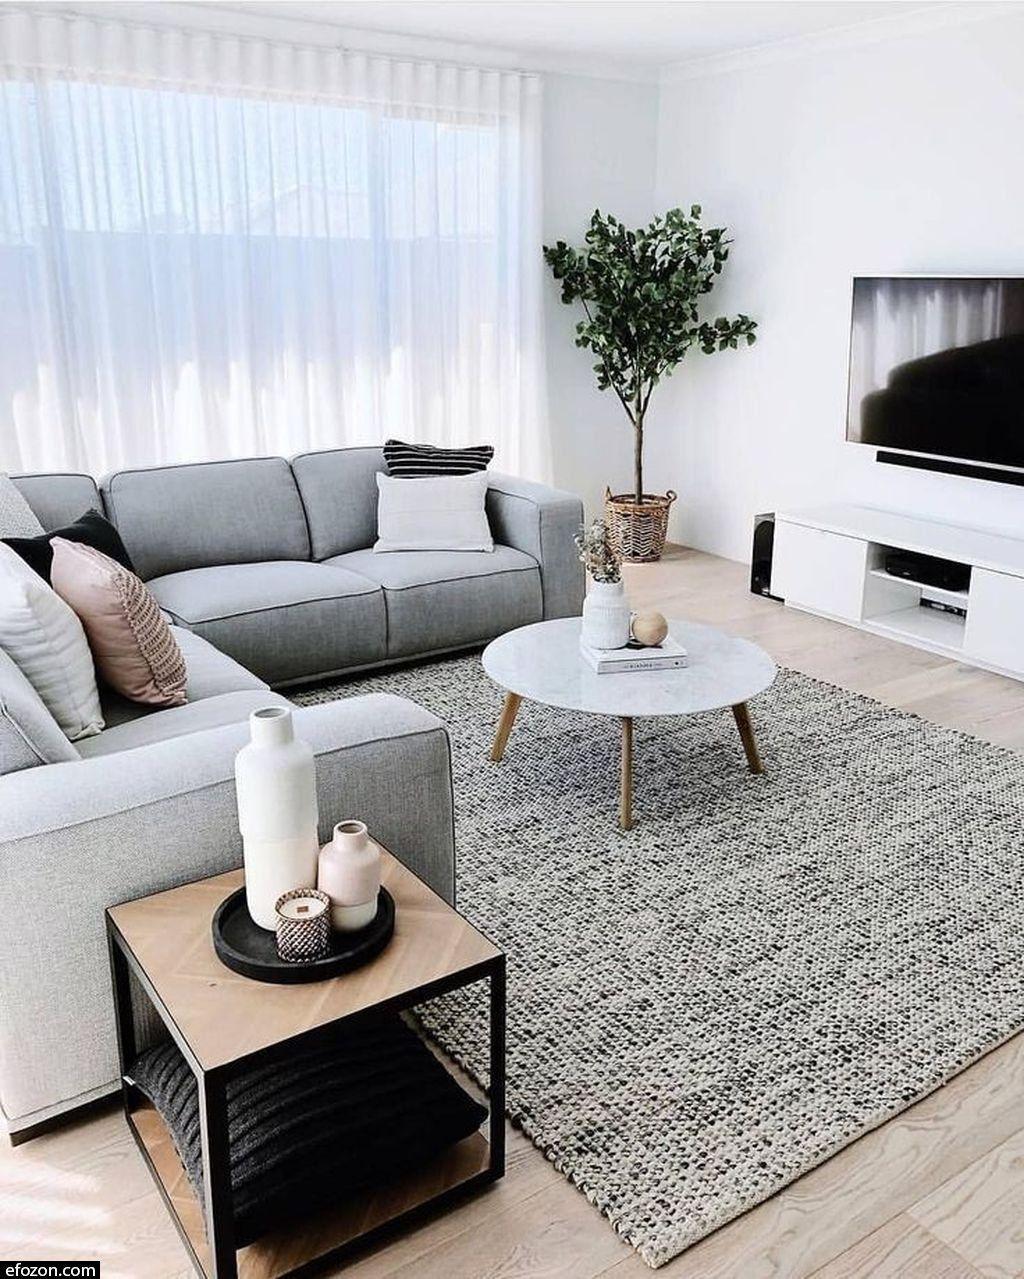 34 Creative Modern Living Room Decor Options Image 8 Of 63 Living Room Color Schemes Living Room Decor Apartment Minimalist Living Room Design